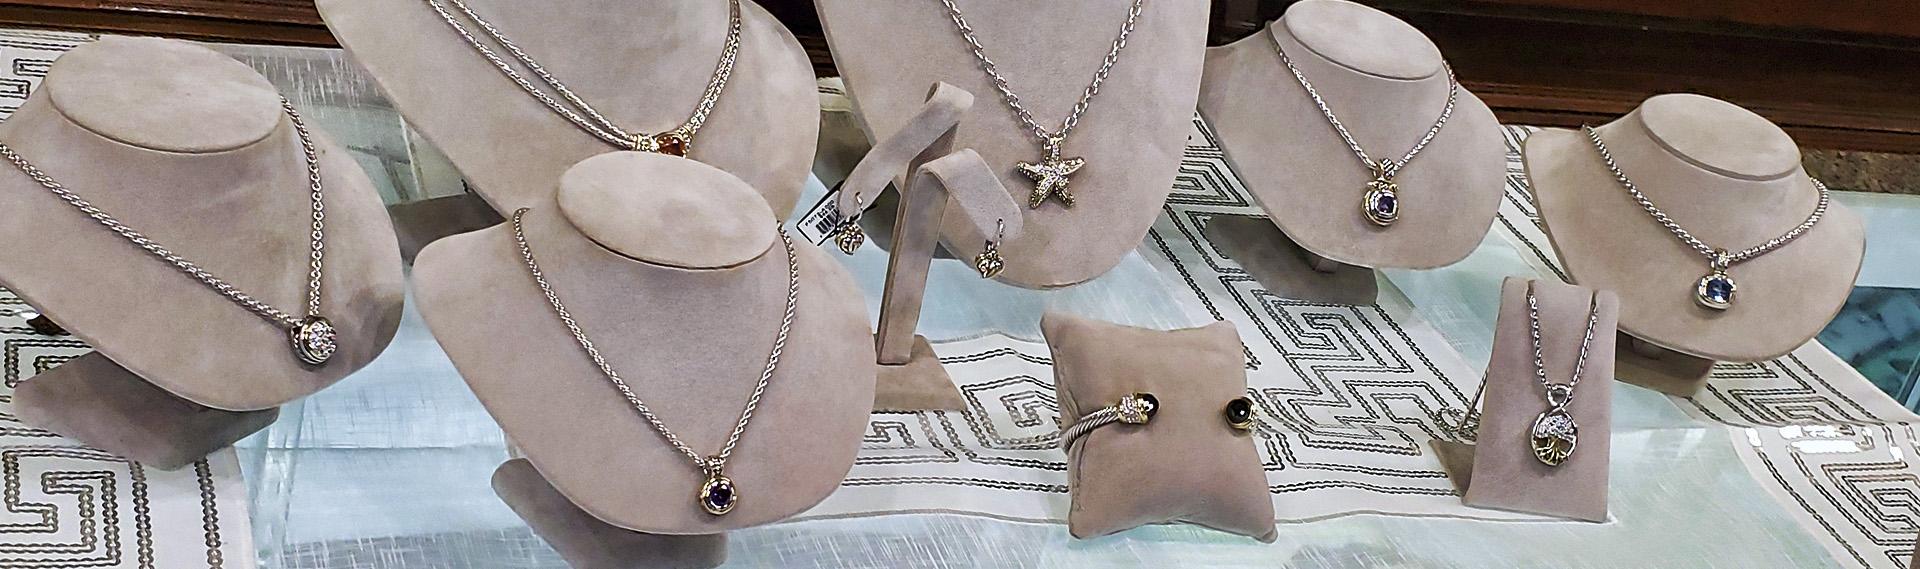 Feldman Jewelers John Medeiros Case image